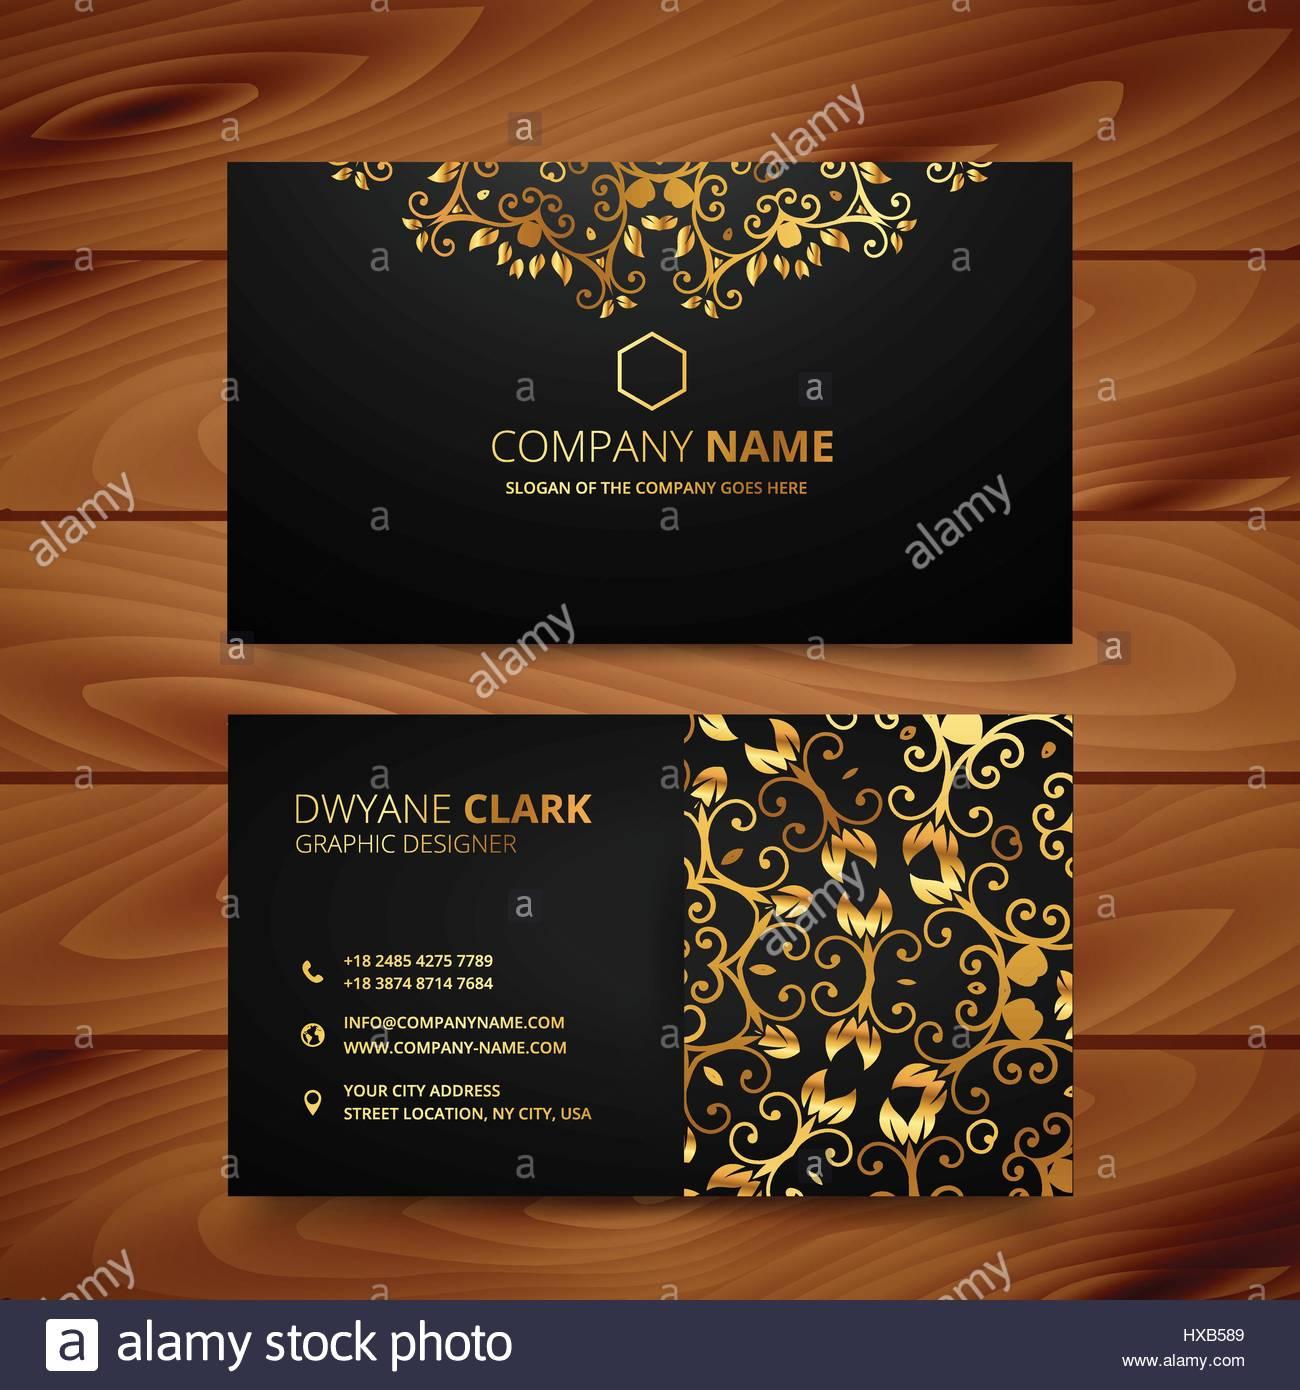 Stylish golden premium luxury business card template design stock stylish golden premium luxury business card template design reheart Images